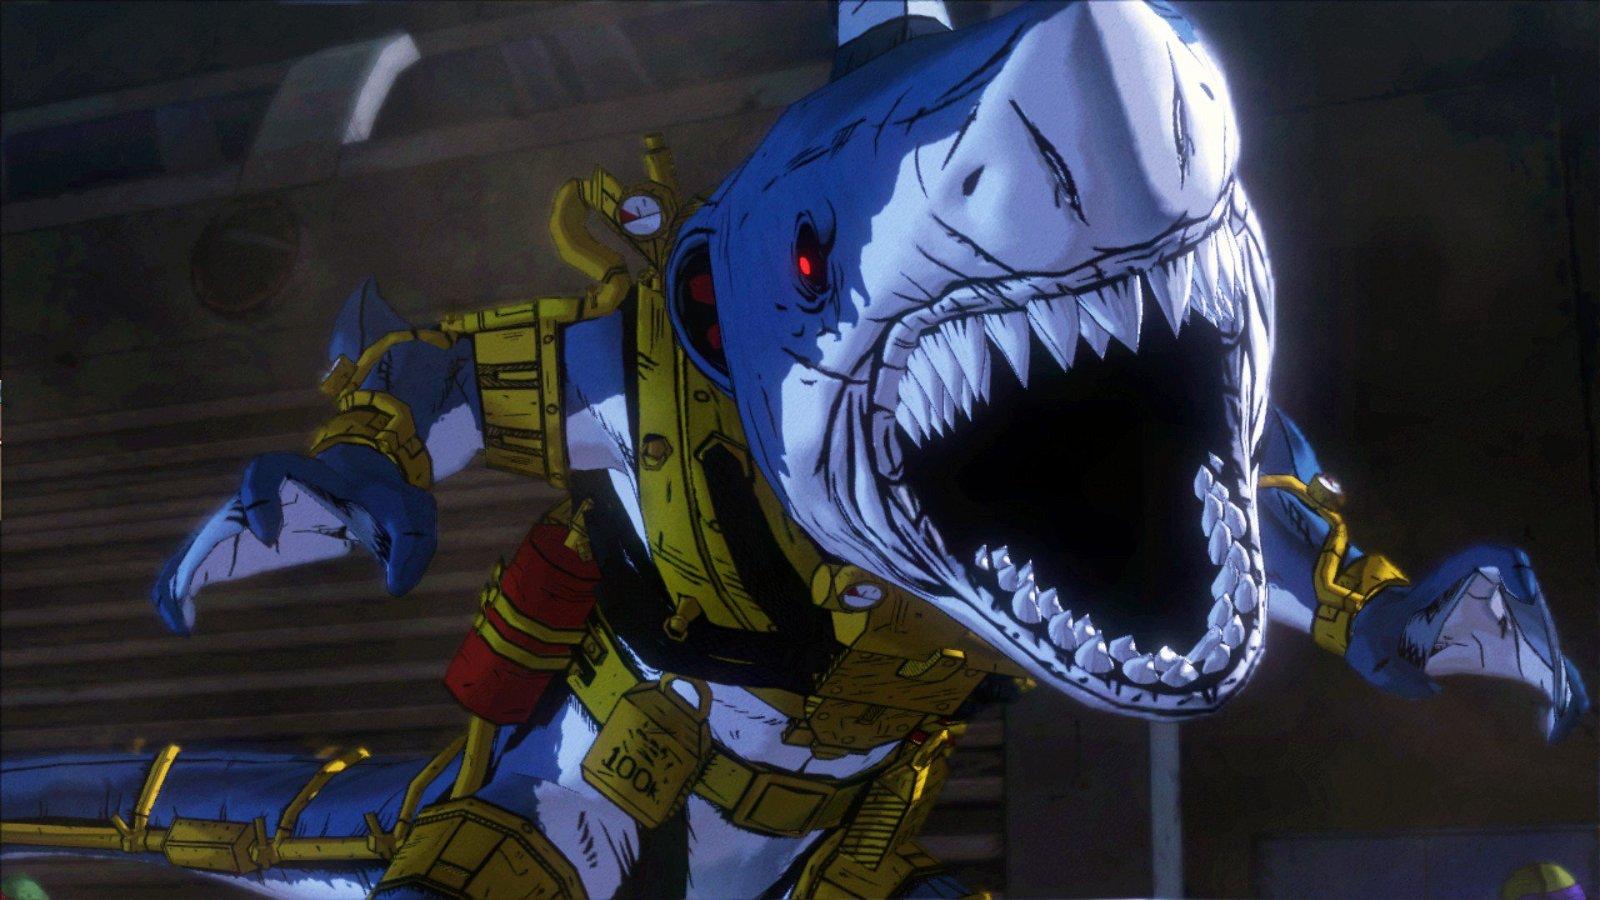 Teenage Mutant Ninja Turtles: Mutants In Manhattan (Ps4) Review 4